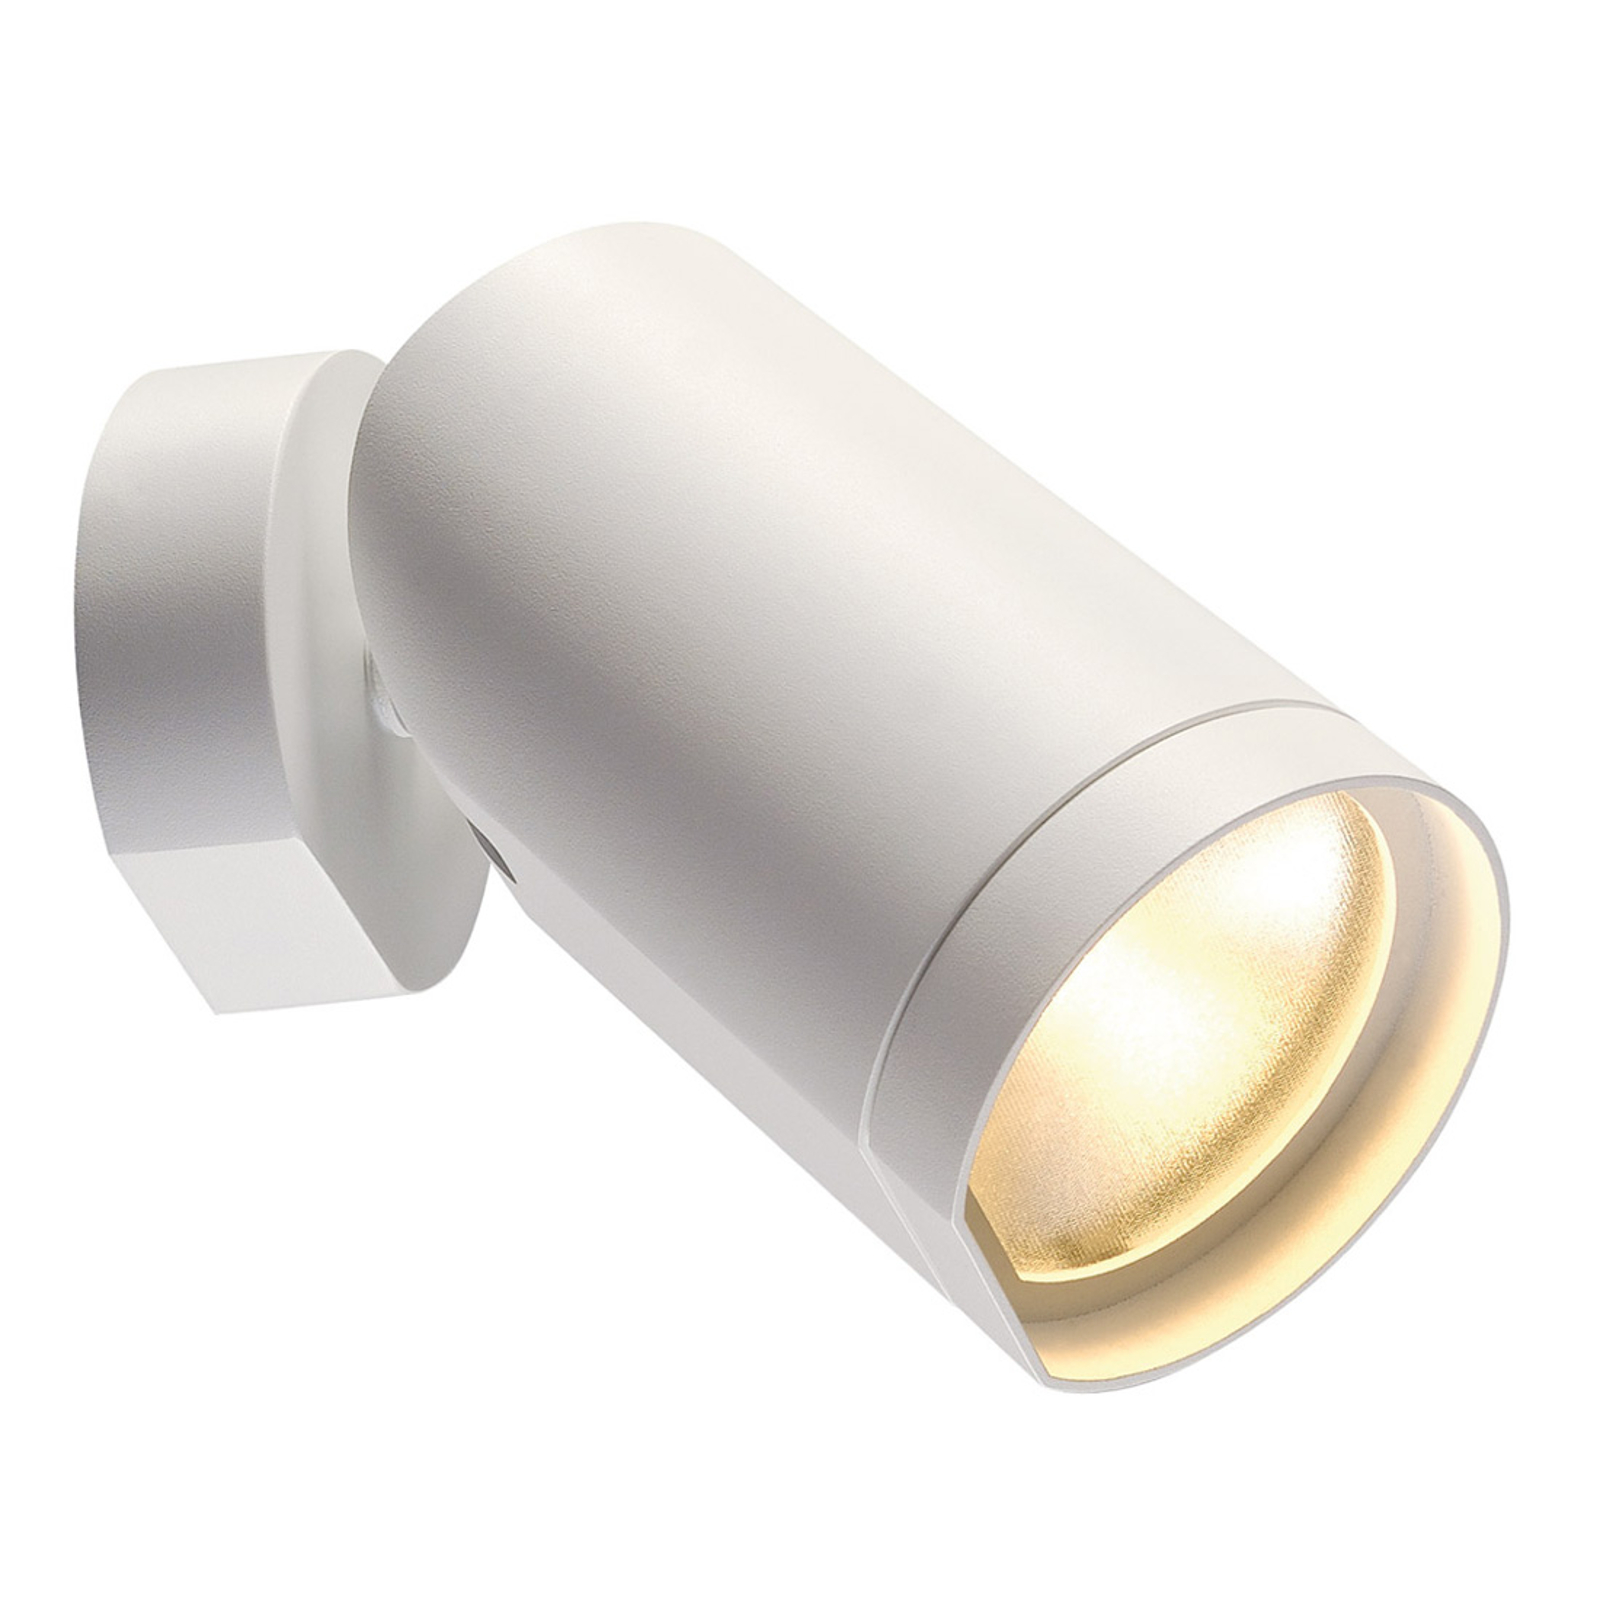 Spot LED de plafond Bilas pivotant 1 lampe, blanc